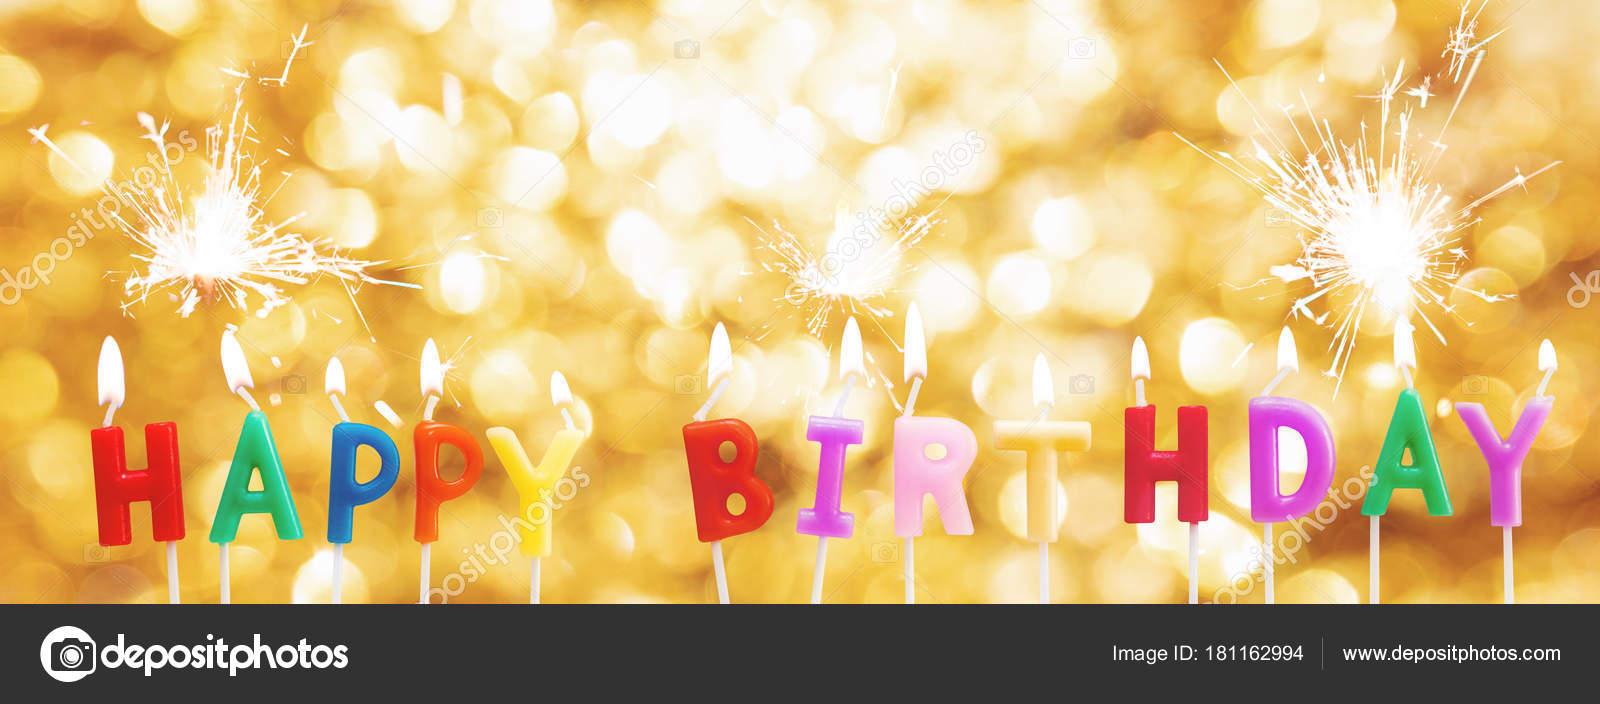 Happy Birthday Candles Golden Bokeh Light Background Sparkler Stock Photo